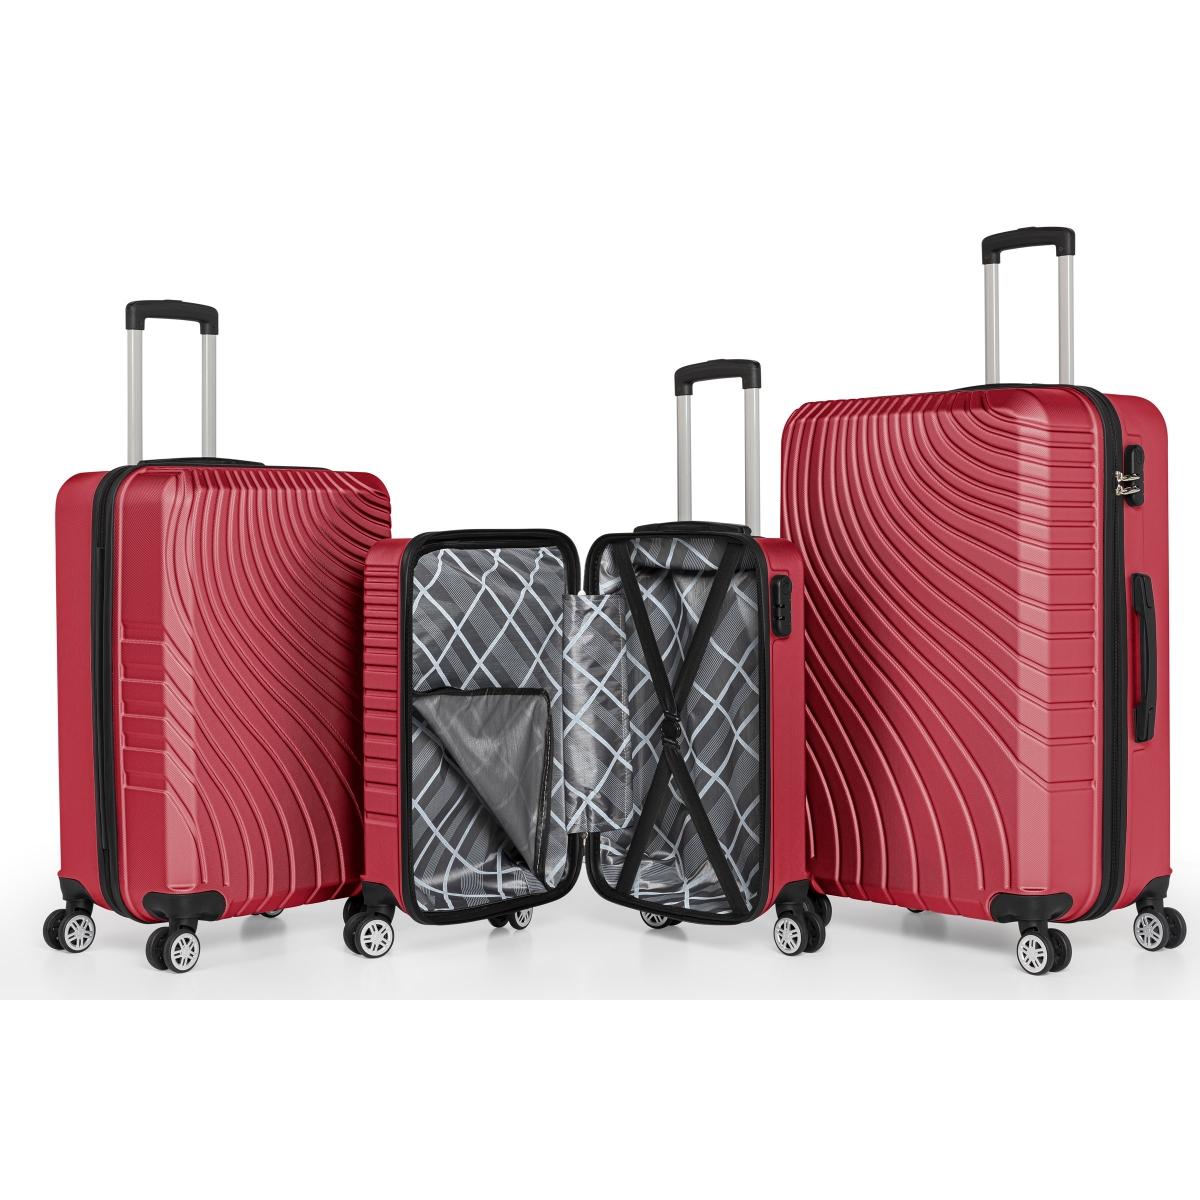 Gedox Abs 3'lü Valiz Seyahat Seti - Model:700.13 Bordo